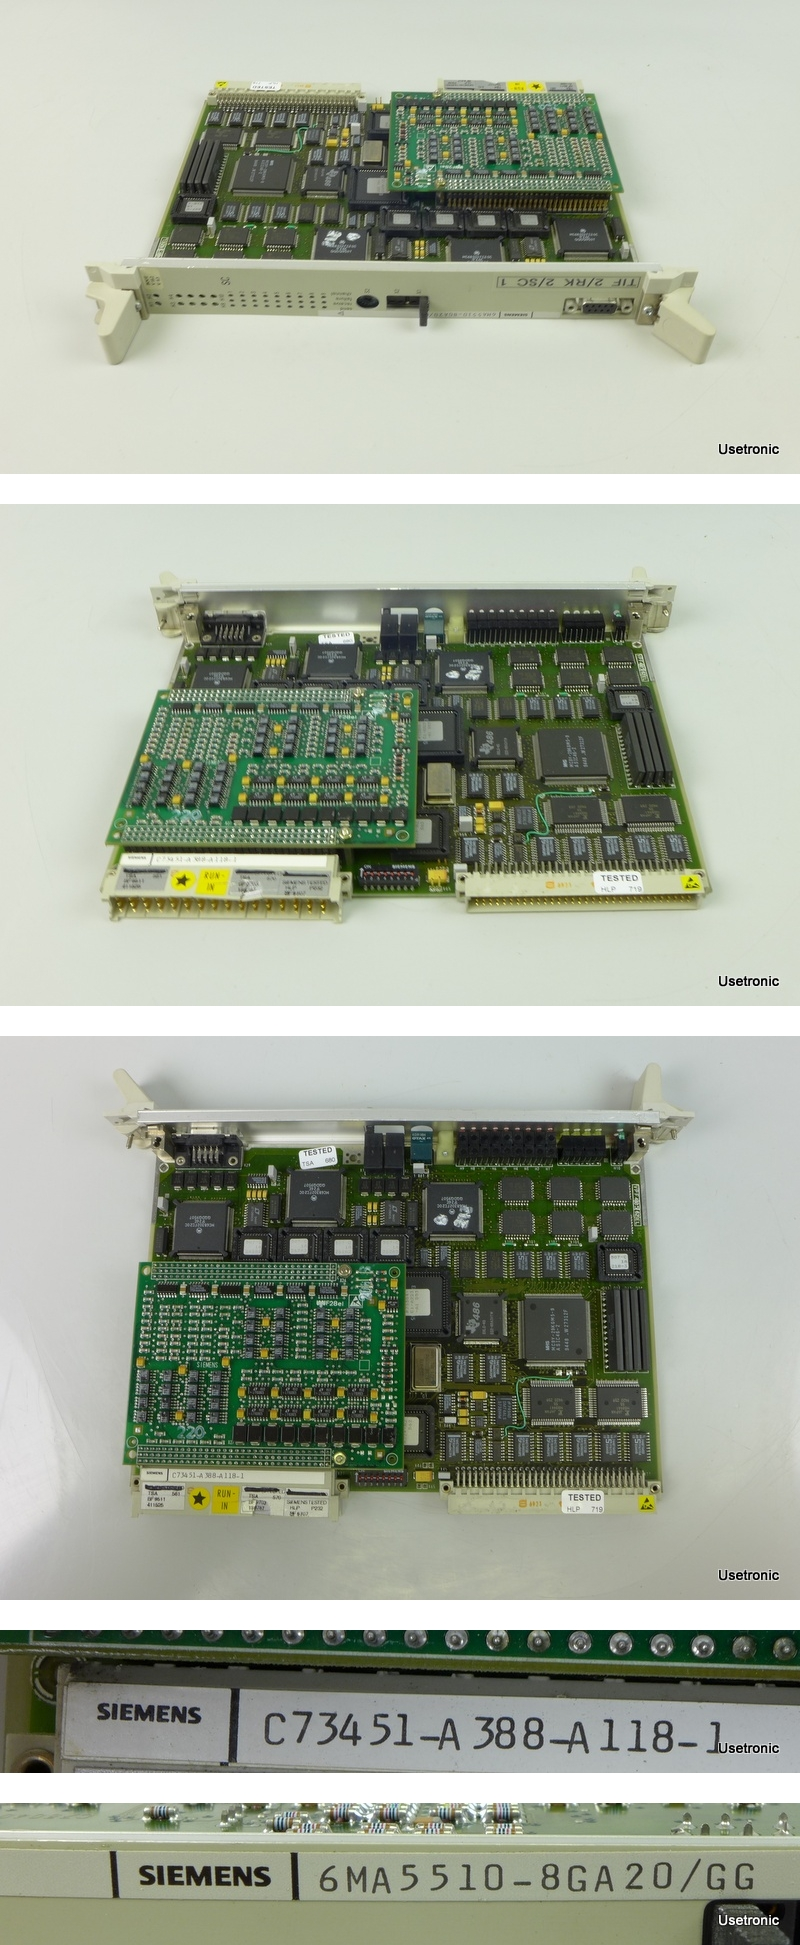 Siemens 6MA5510-8GA20